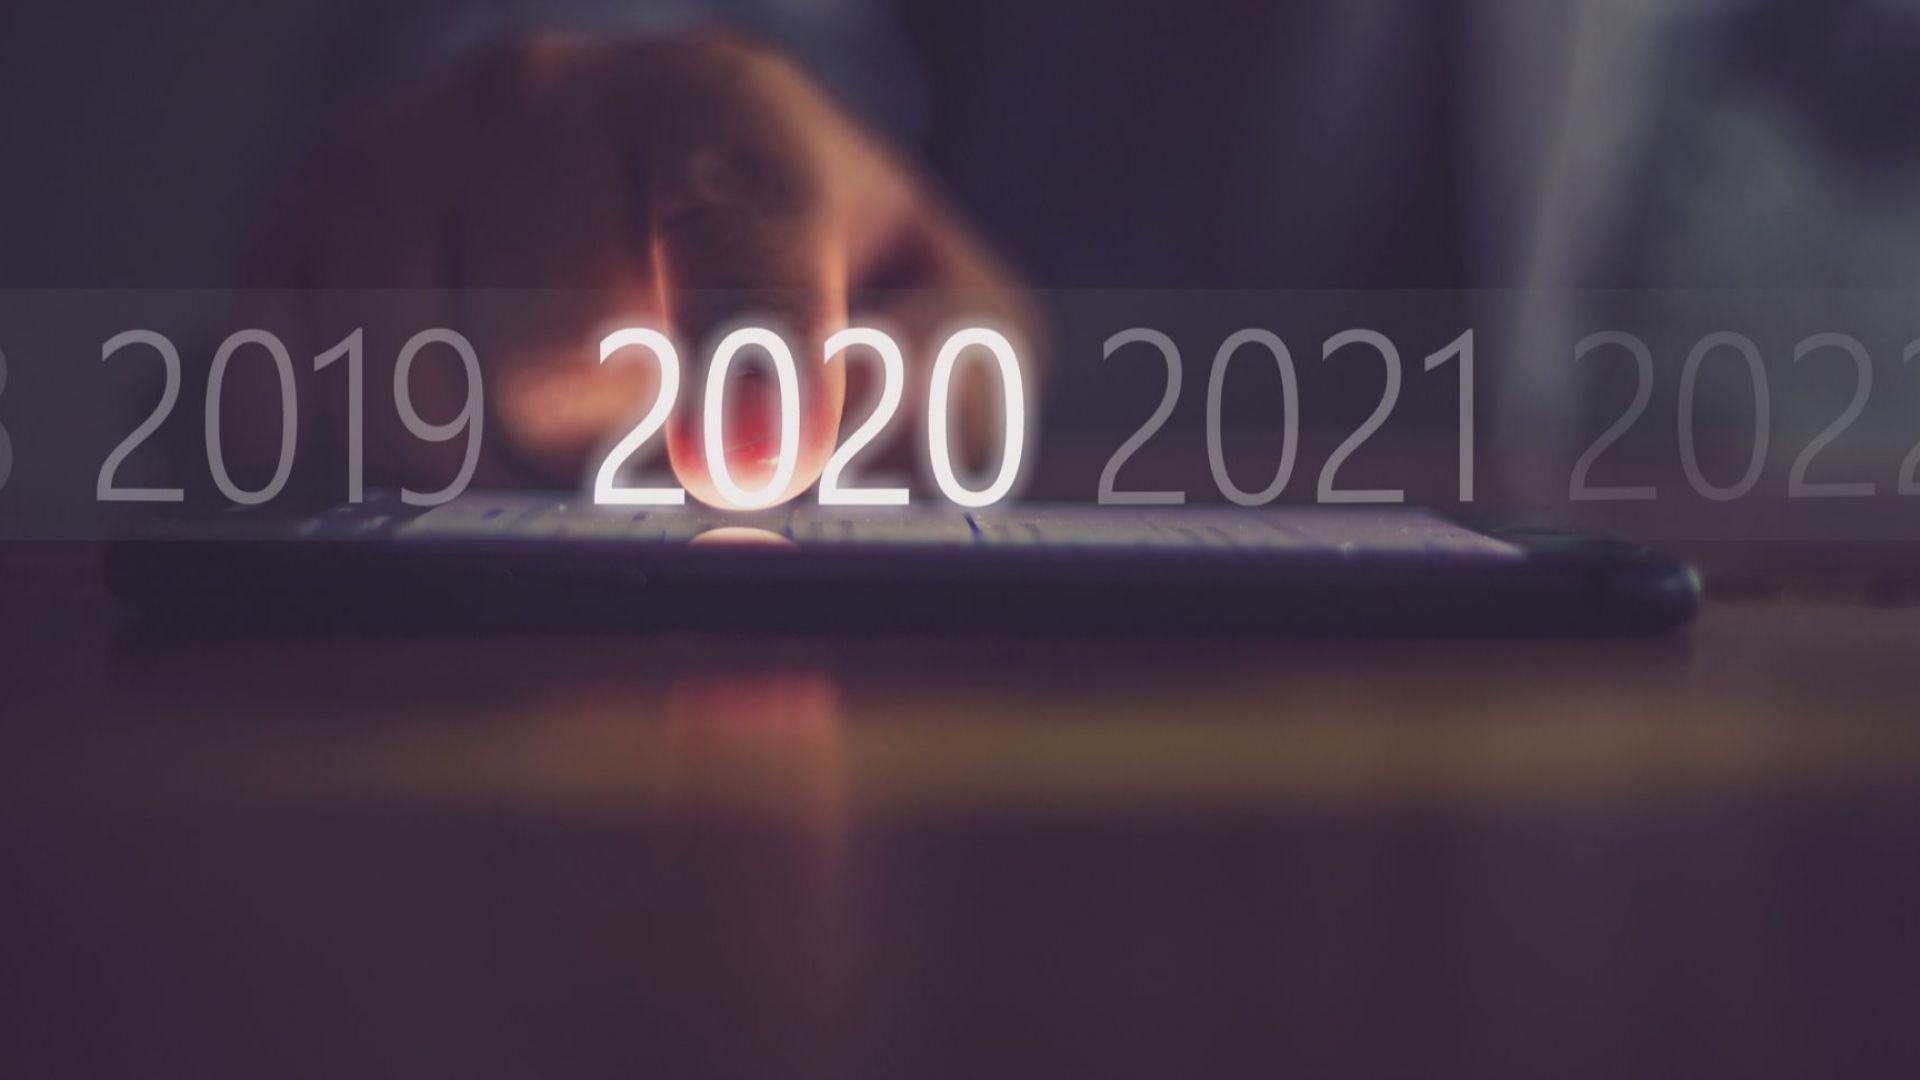 Икономическата 2020 г. : най-важните събития и числа